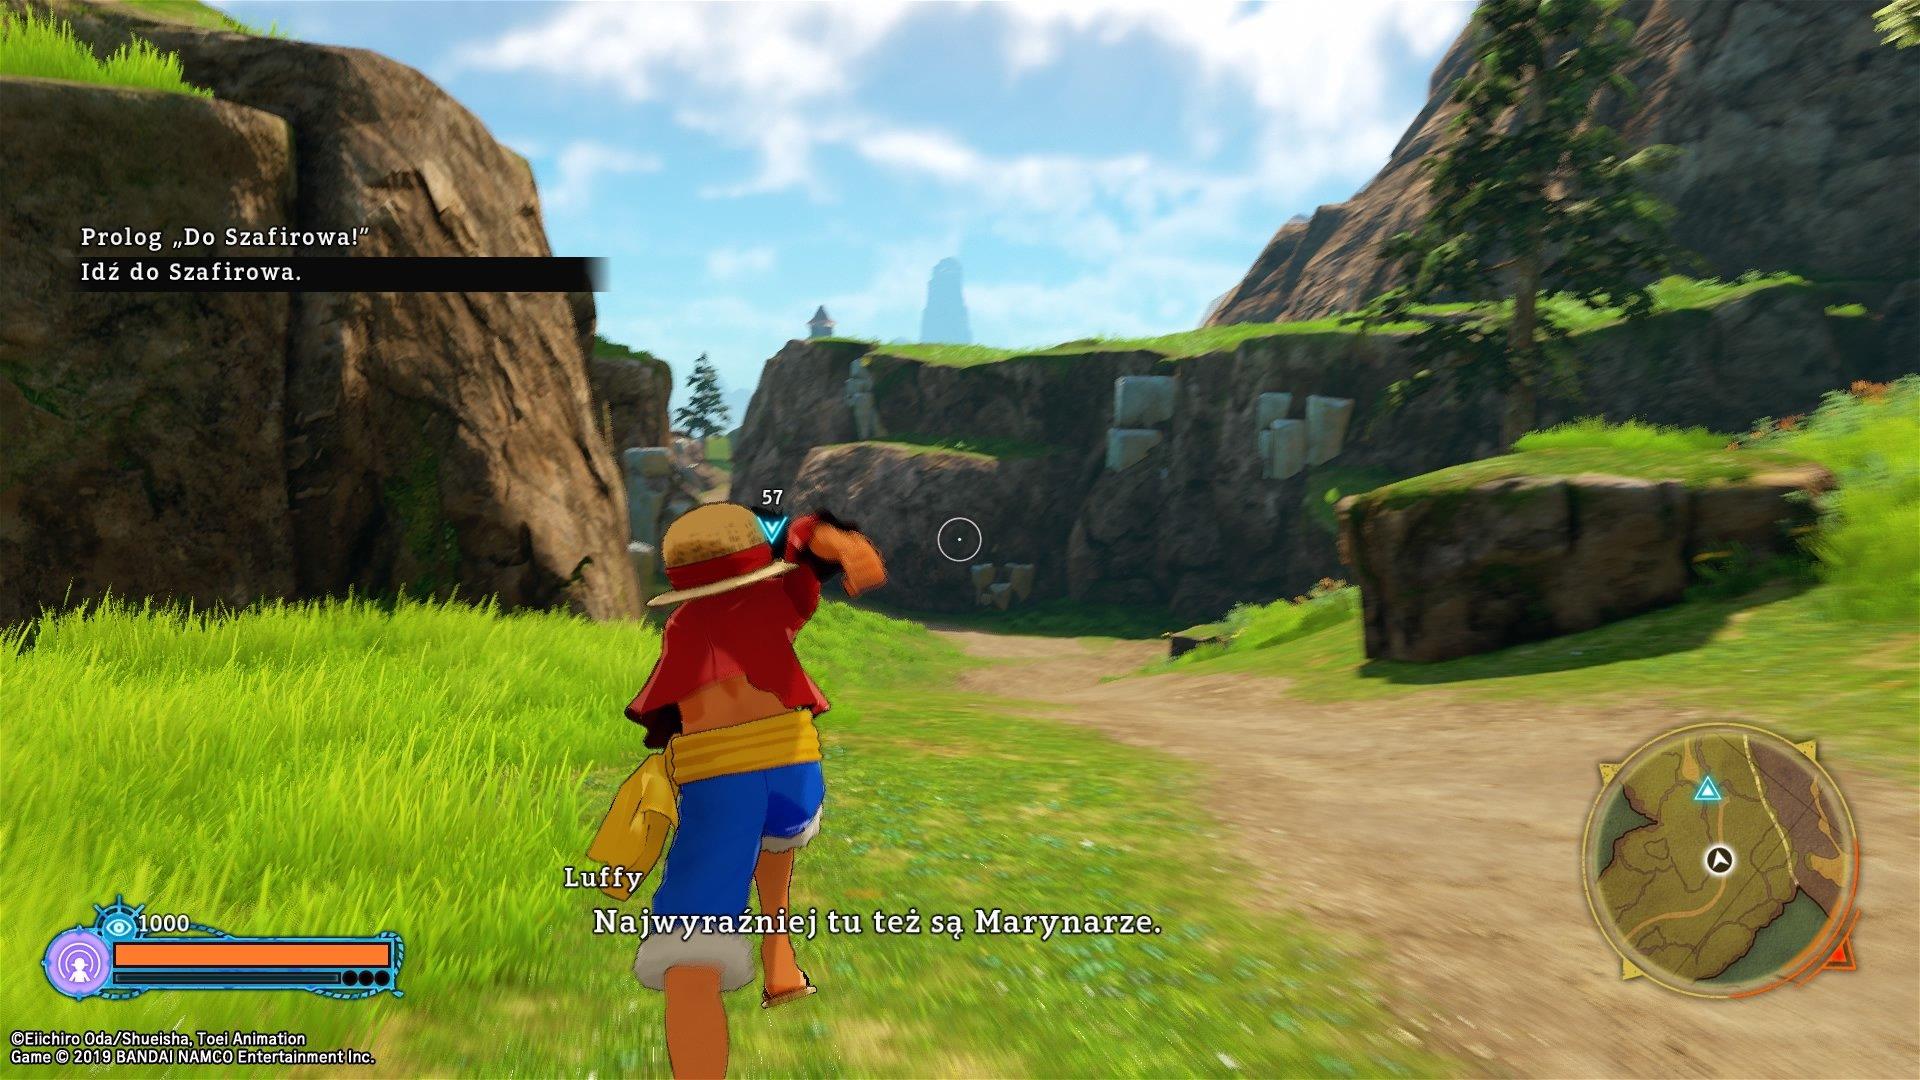 One Piece: World Seeker - screeny z gry